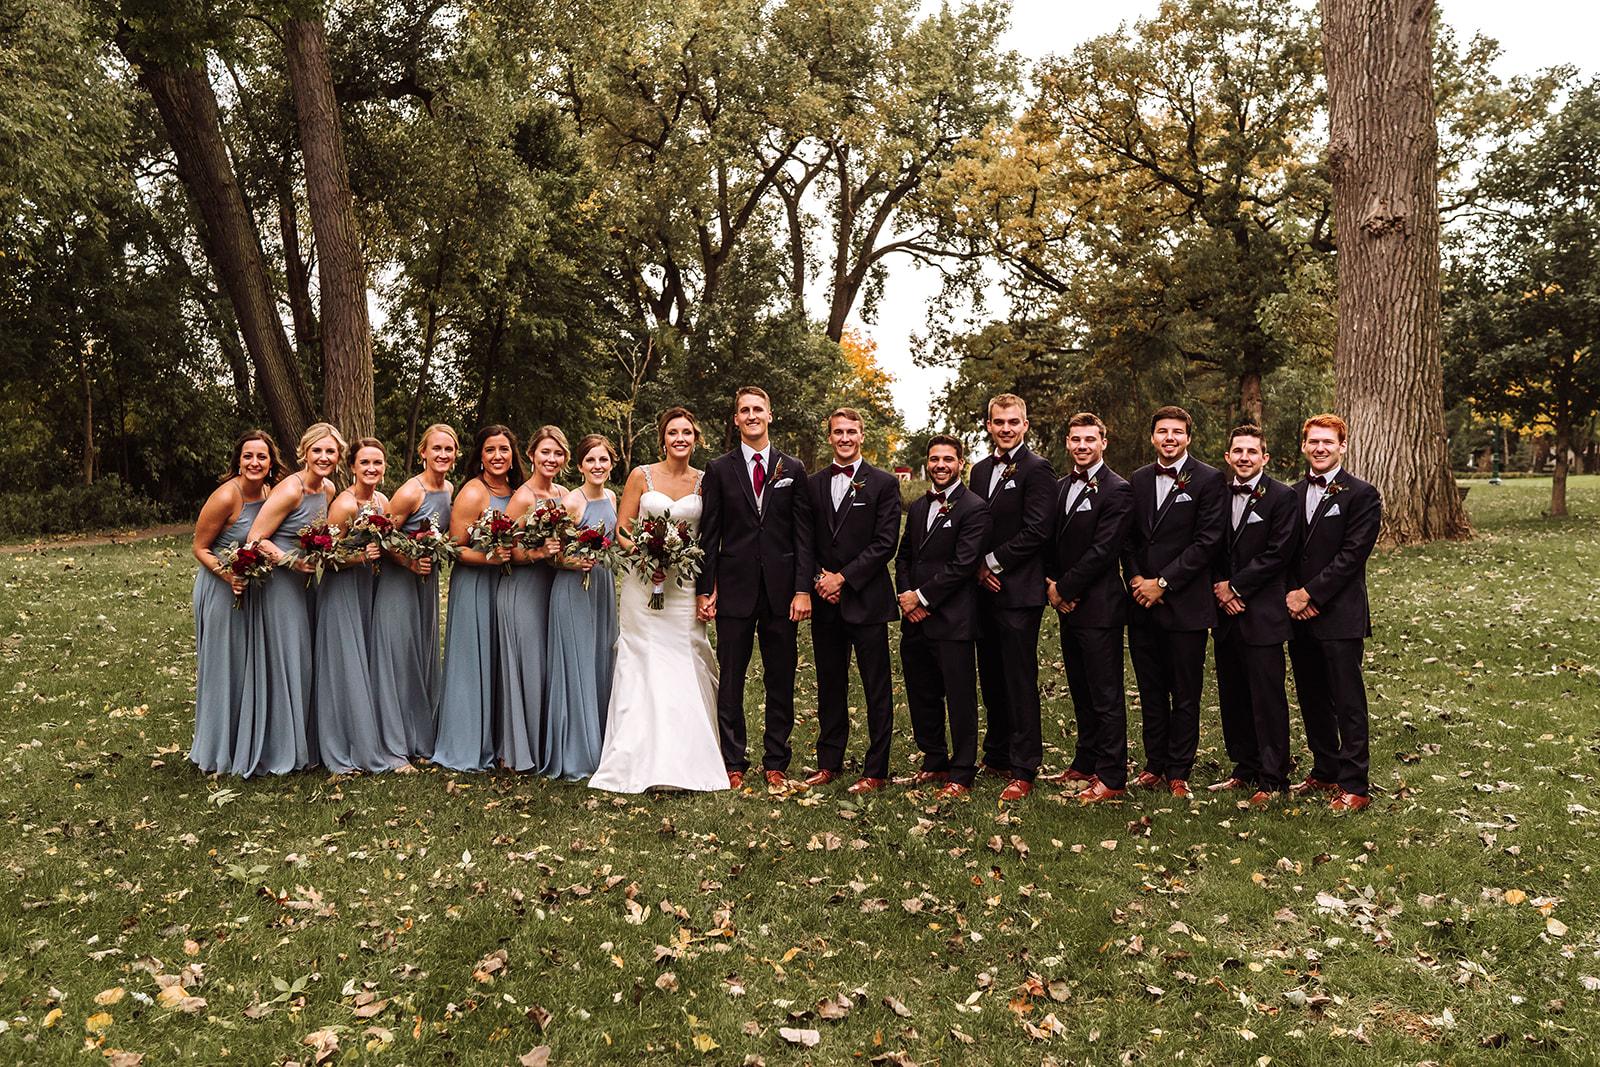 Scott and Andrea Wedding 2018-648.jpg